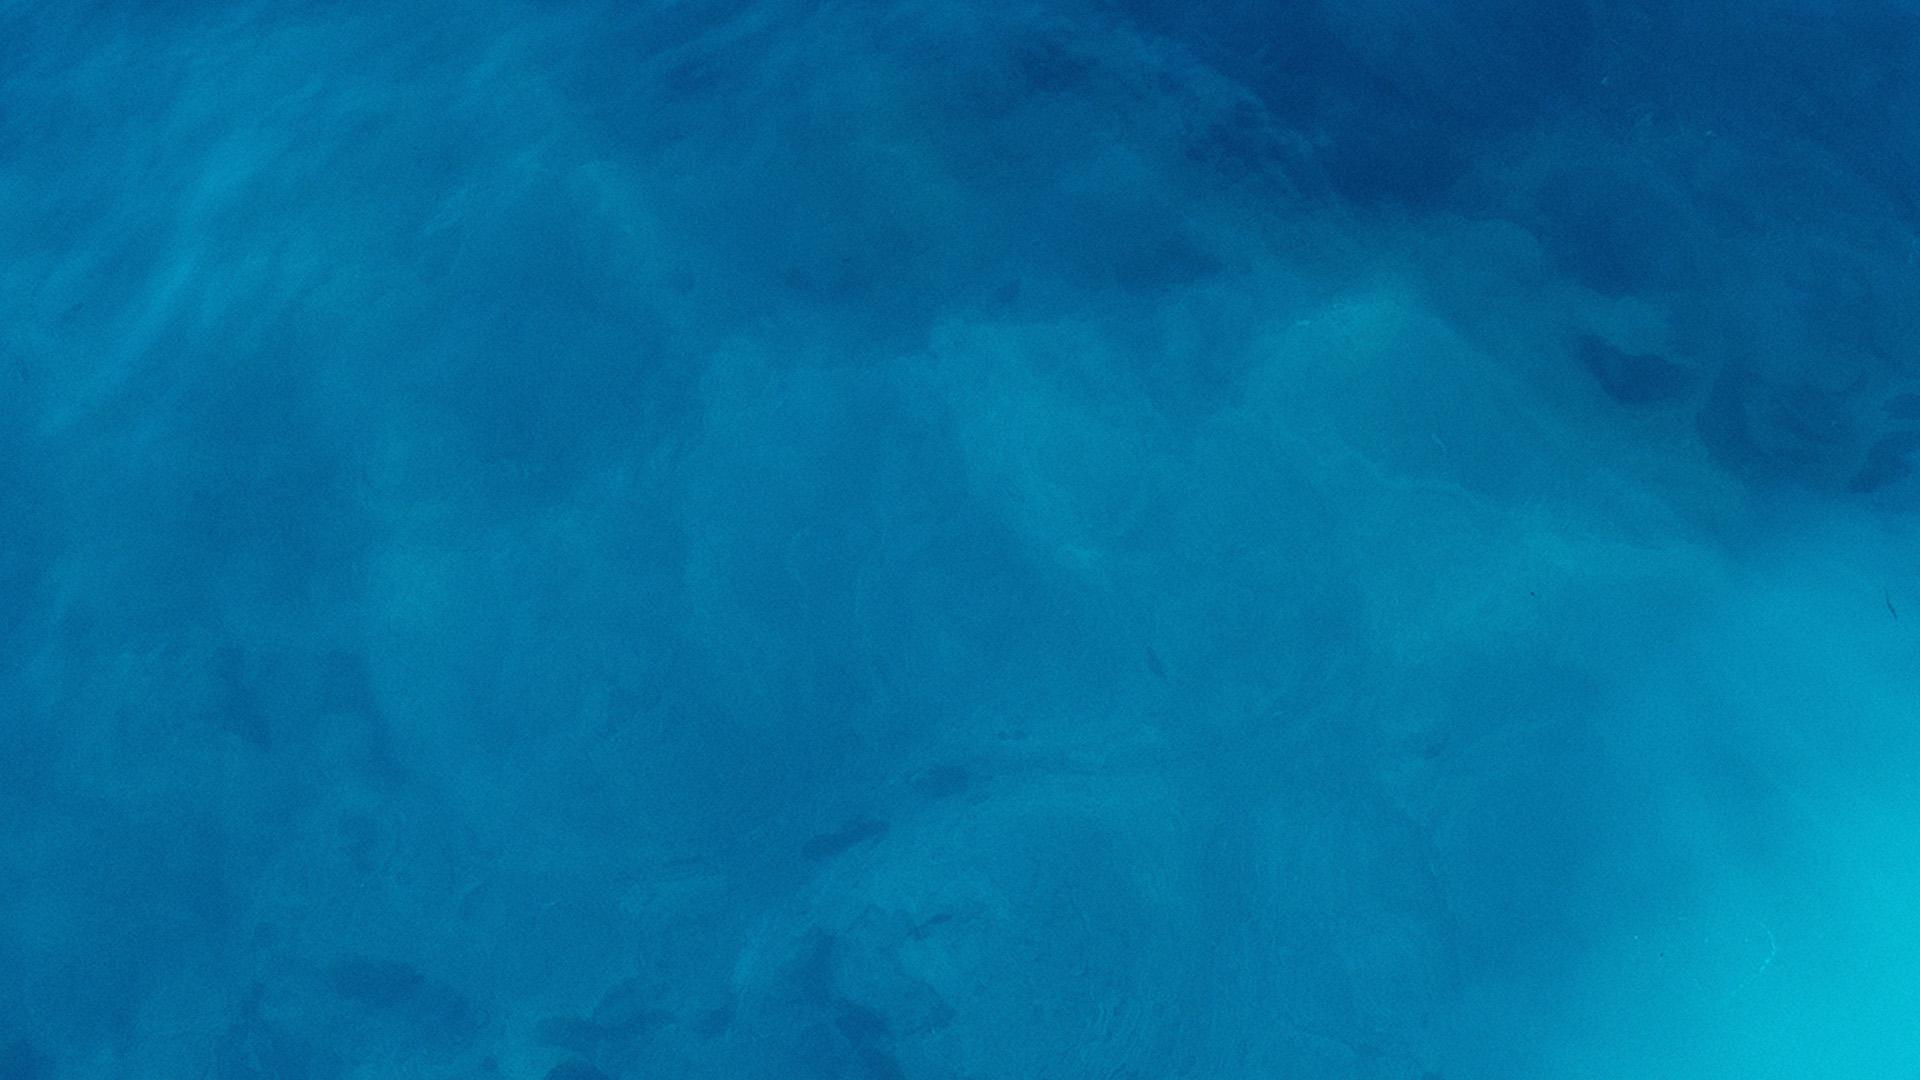 Blue ocean water wallpaper